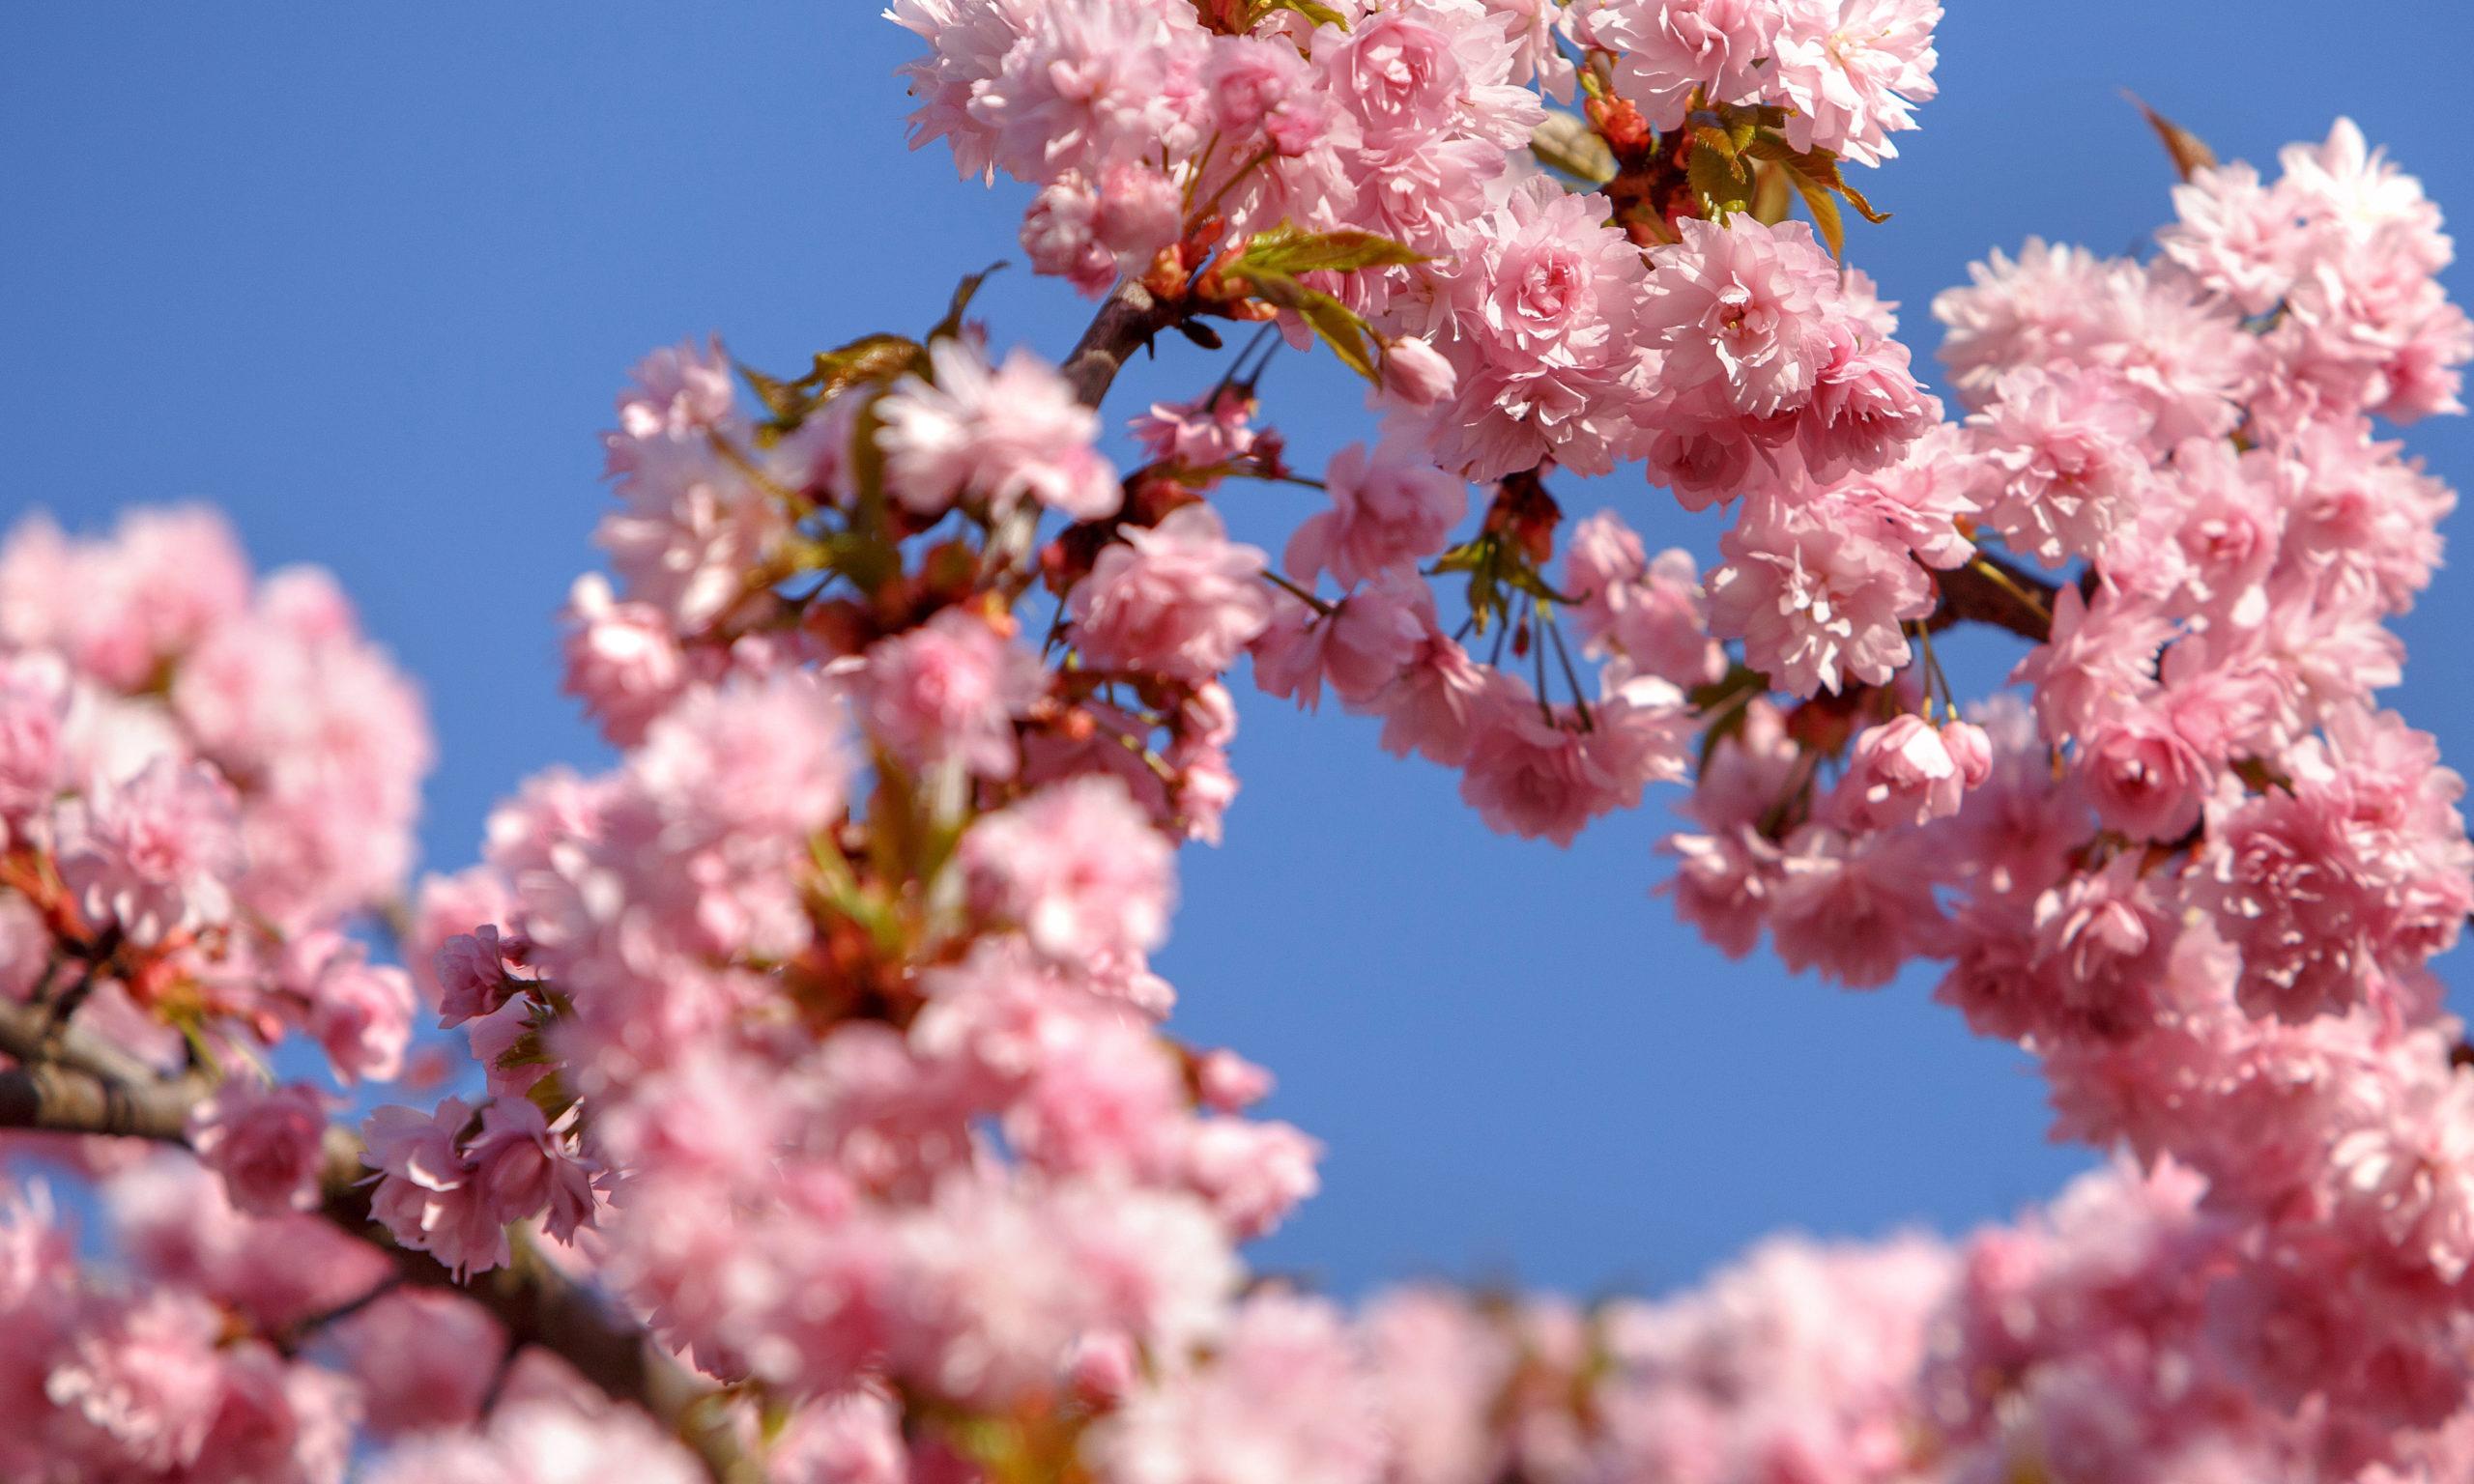 Sakura trees bloom